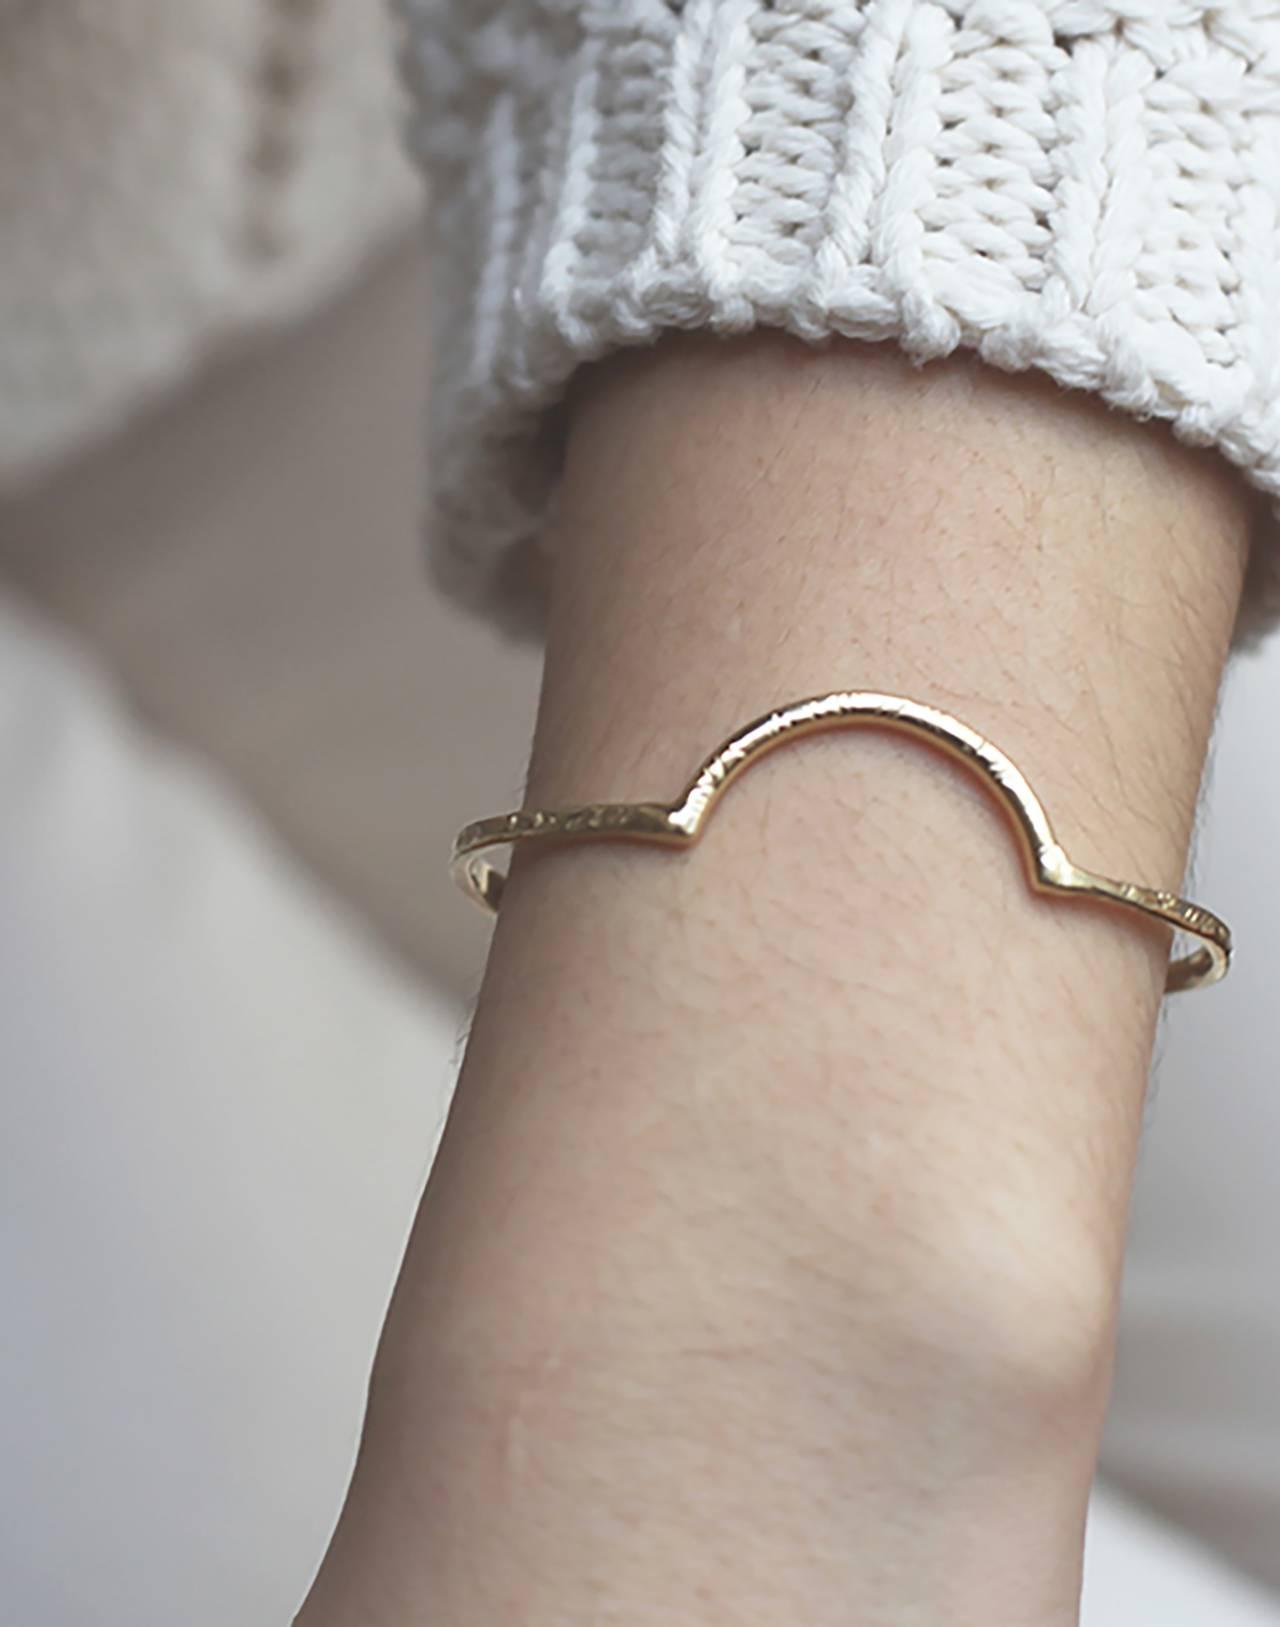 Odette New York® Arc Cuff Bracelet in gold image 2